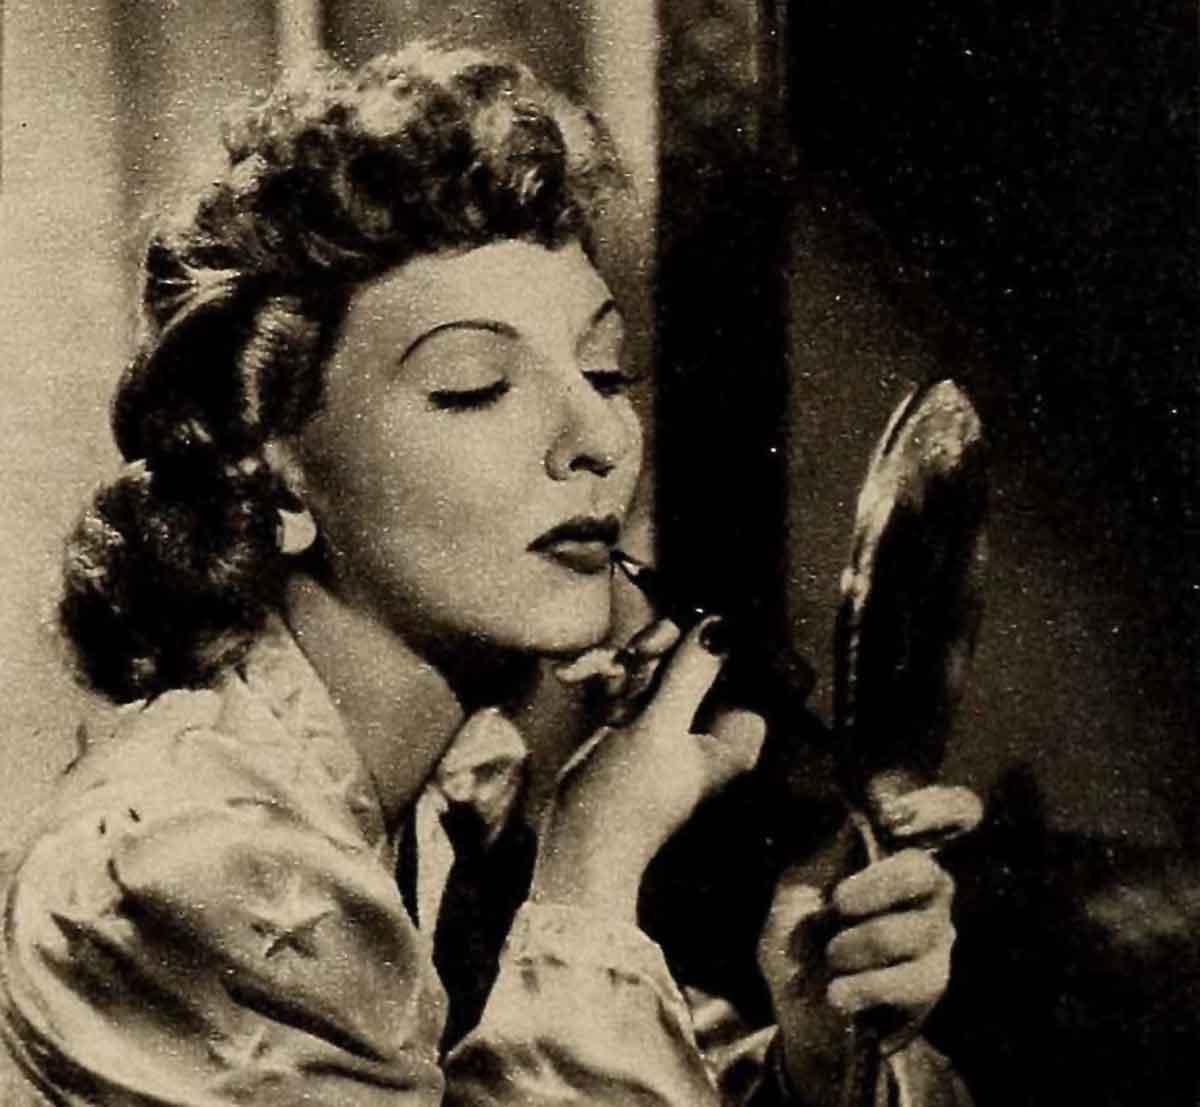 1940s-lipstick-tutorial-with-Mary-Martin